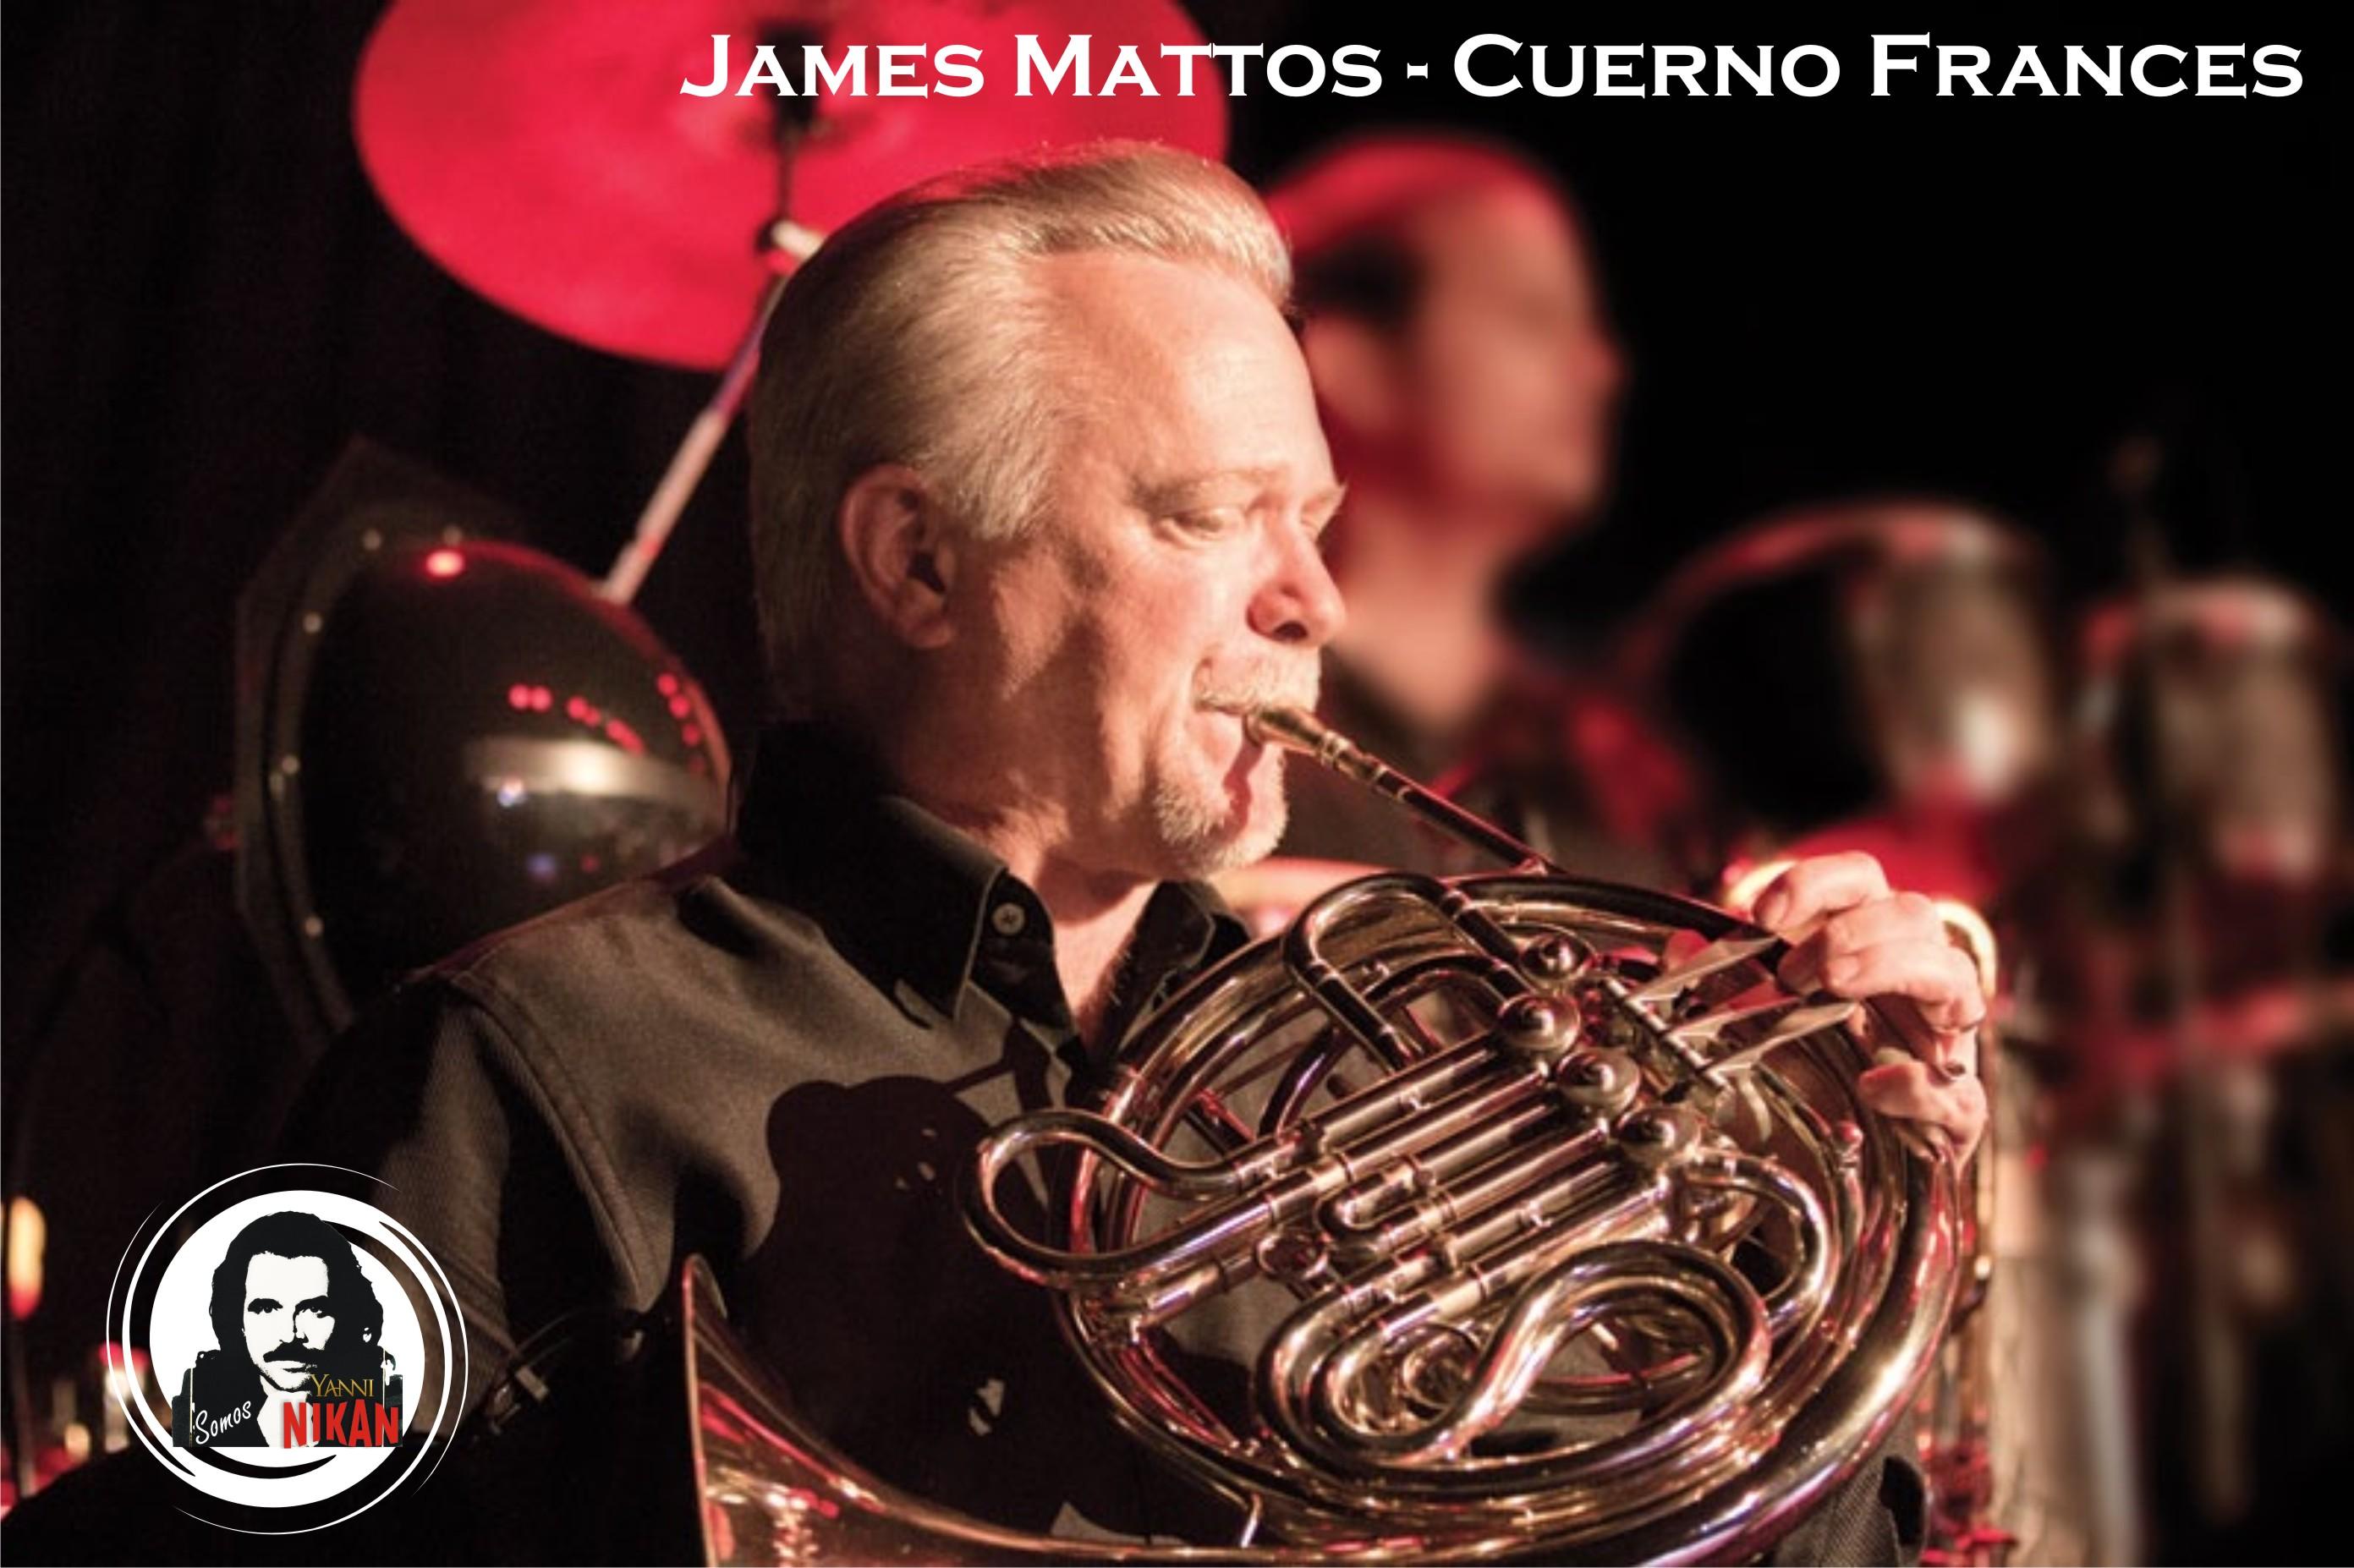 James Mattos